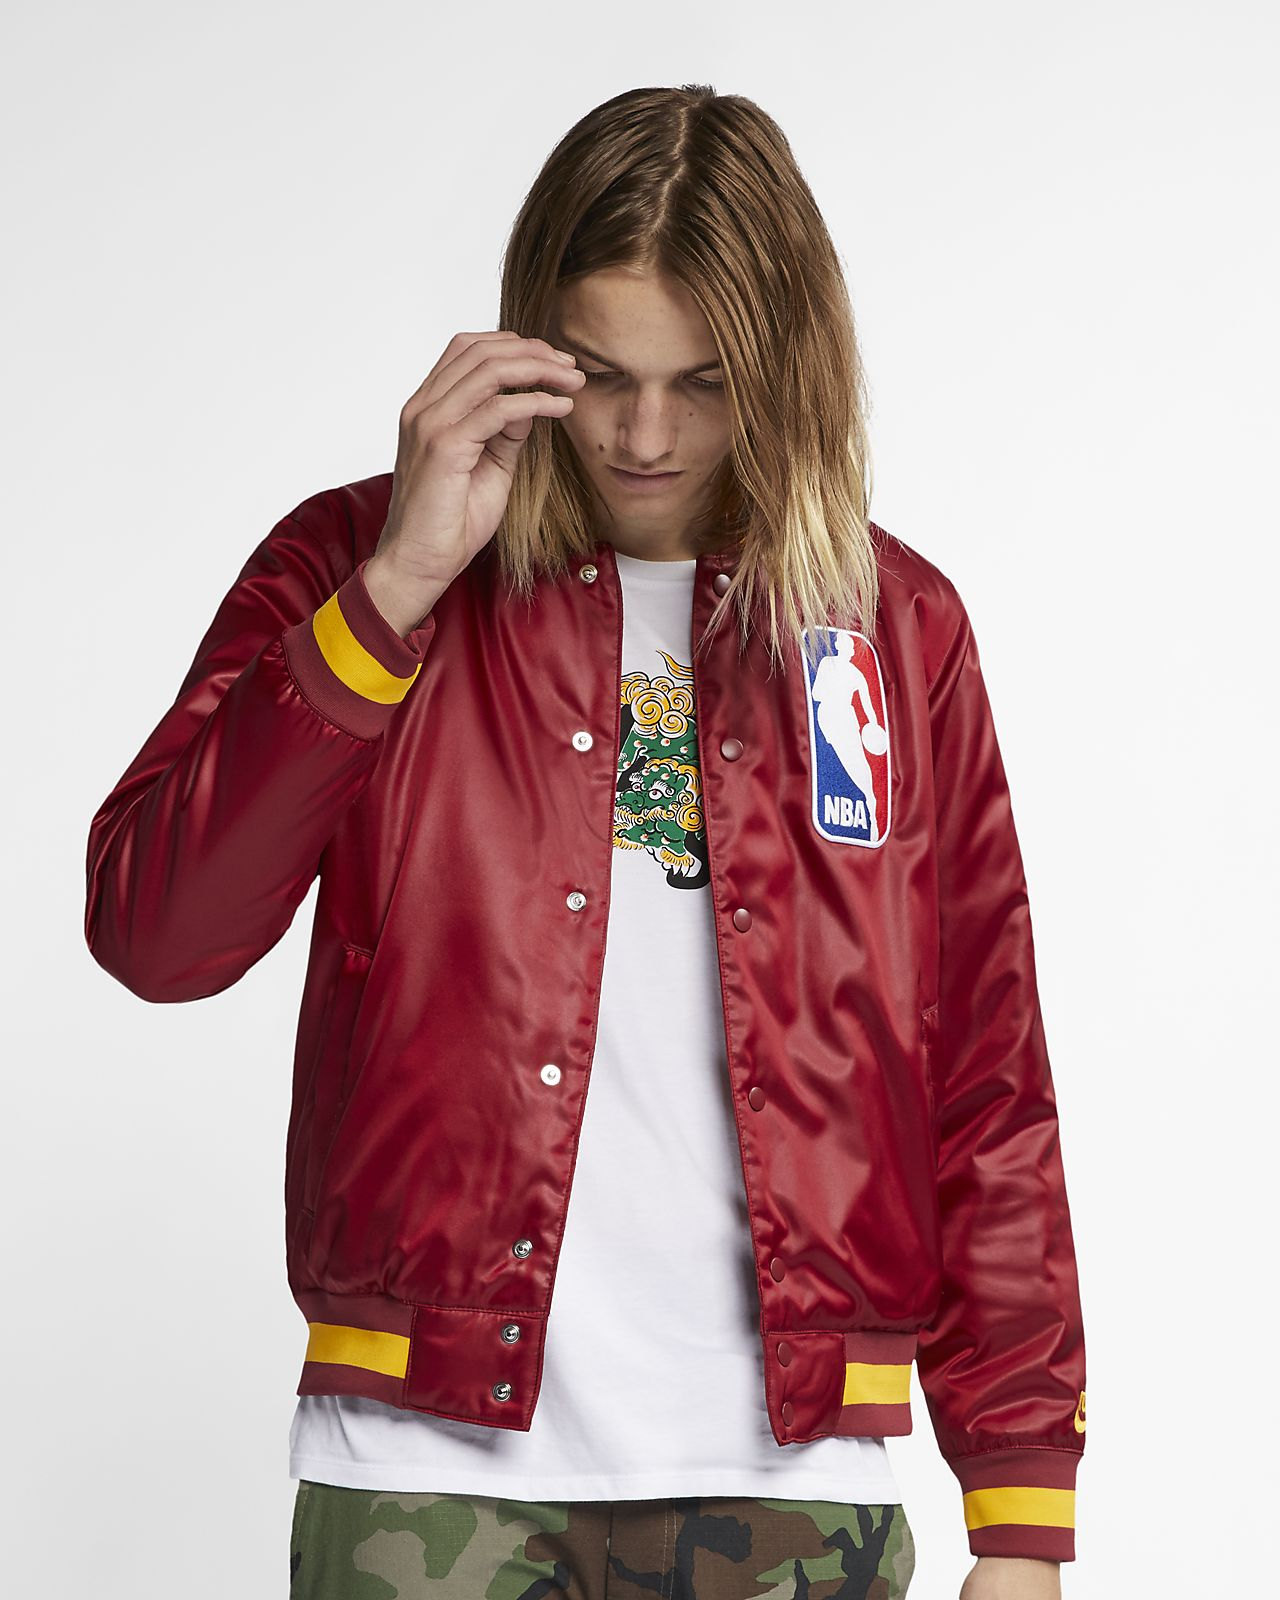 sale retailer 07590 176e8 Men s Skate Bomber Jacket. Nike SB x NBA